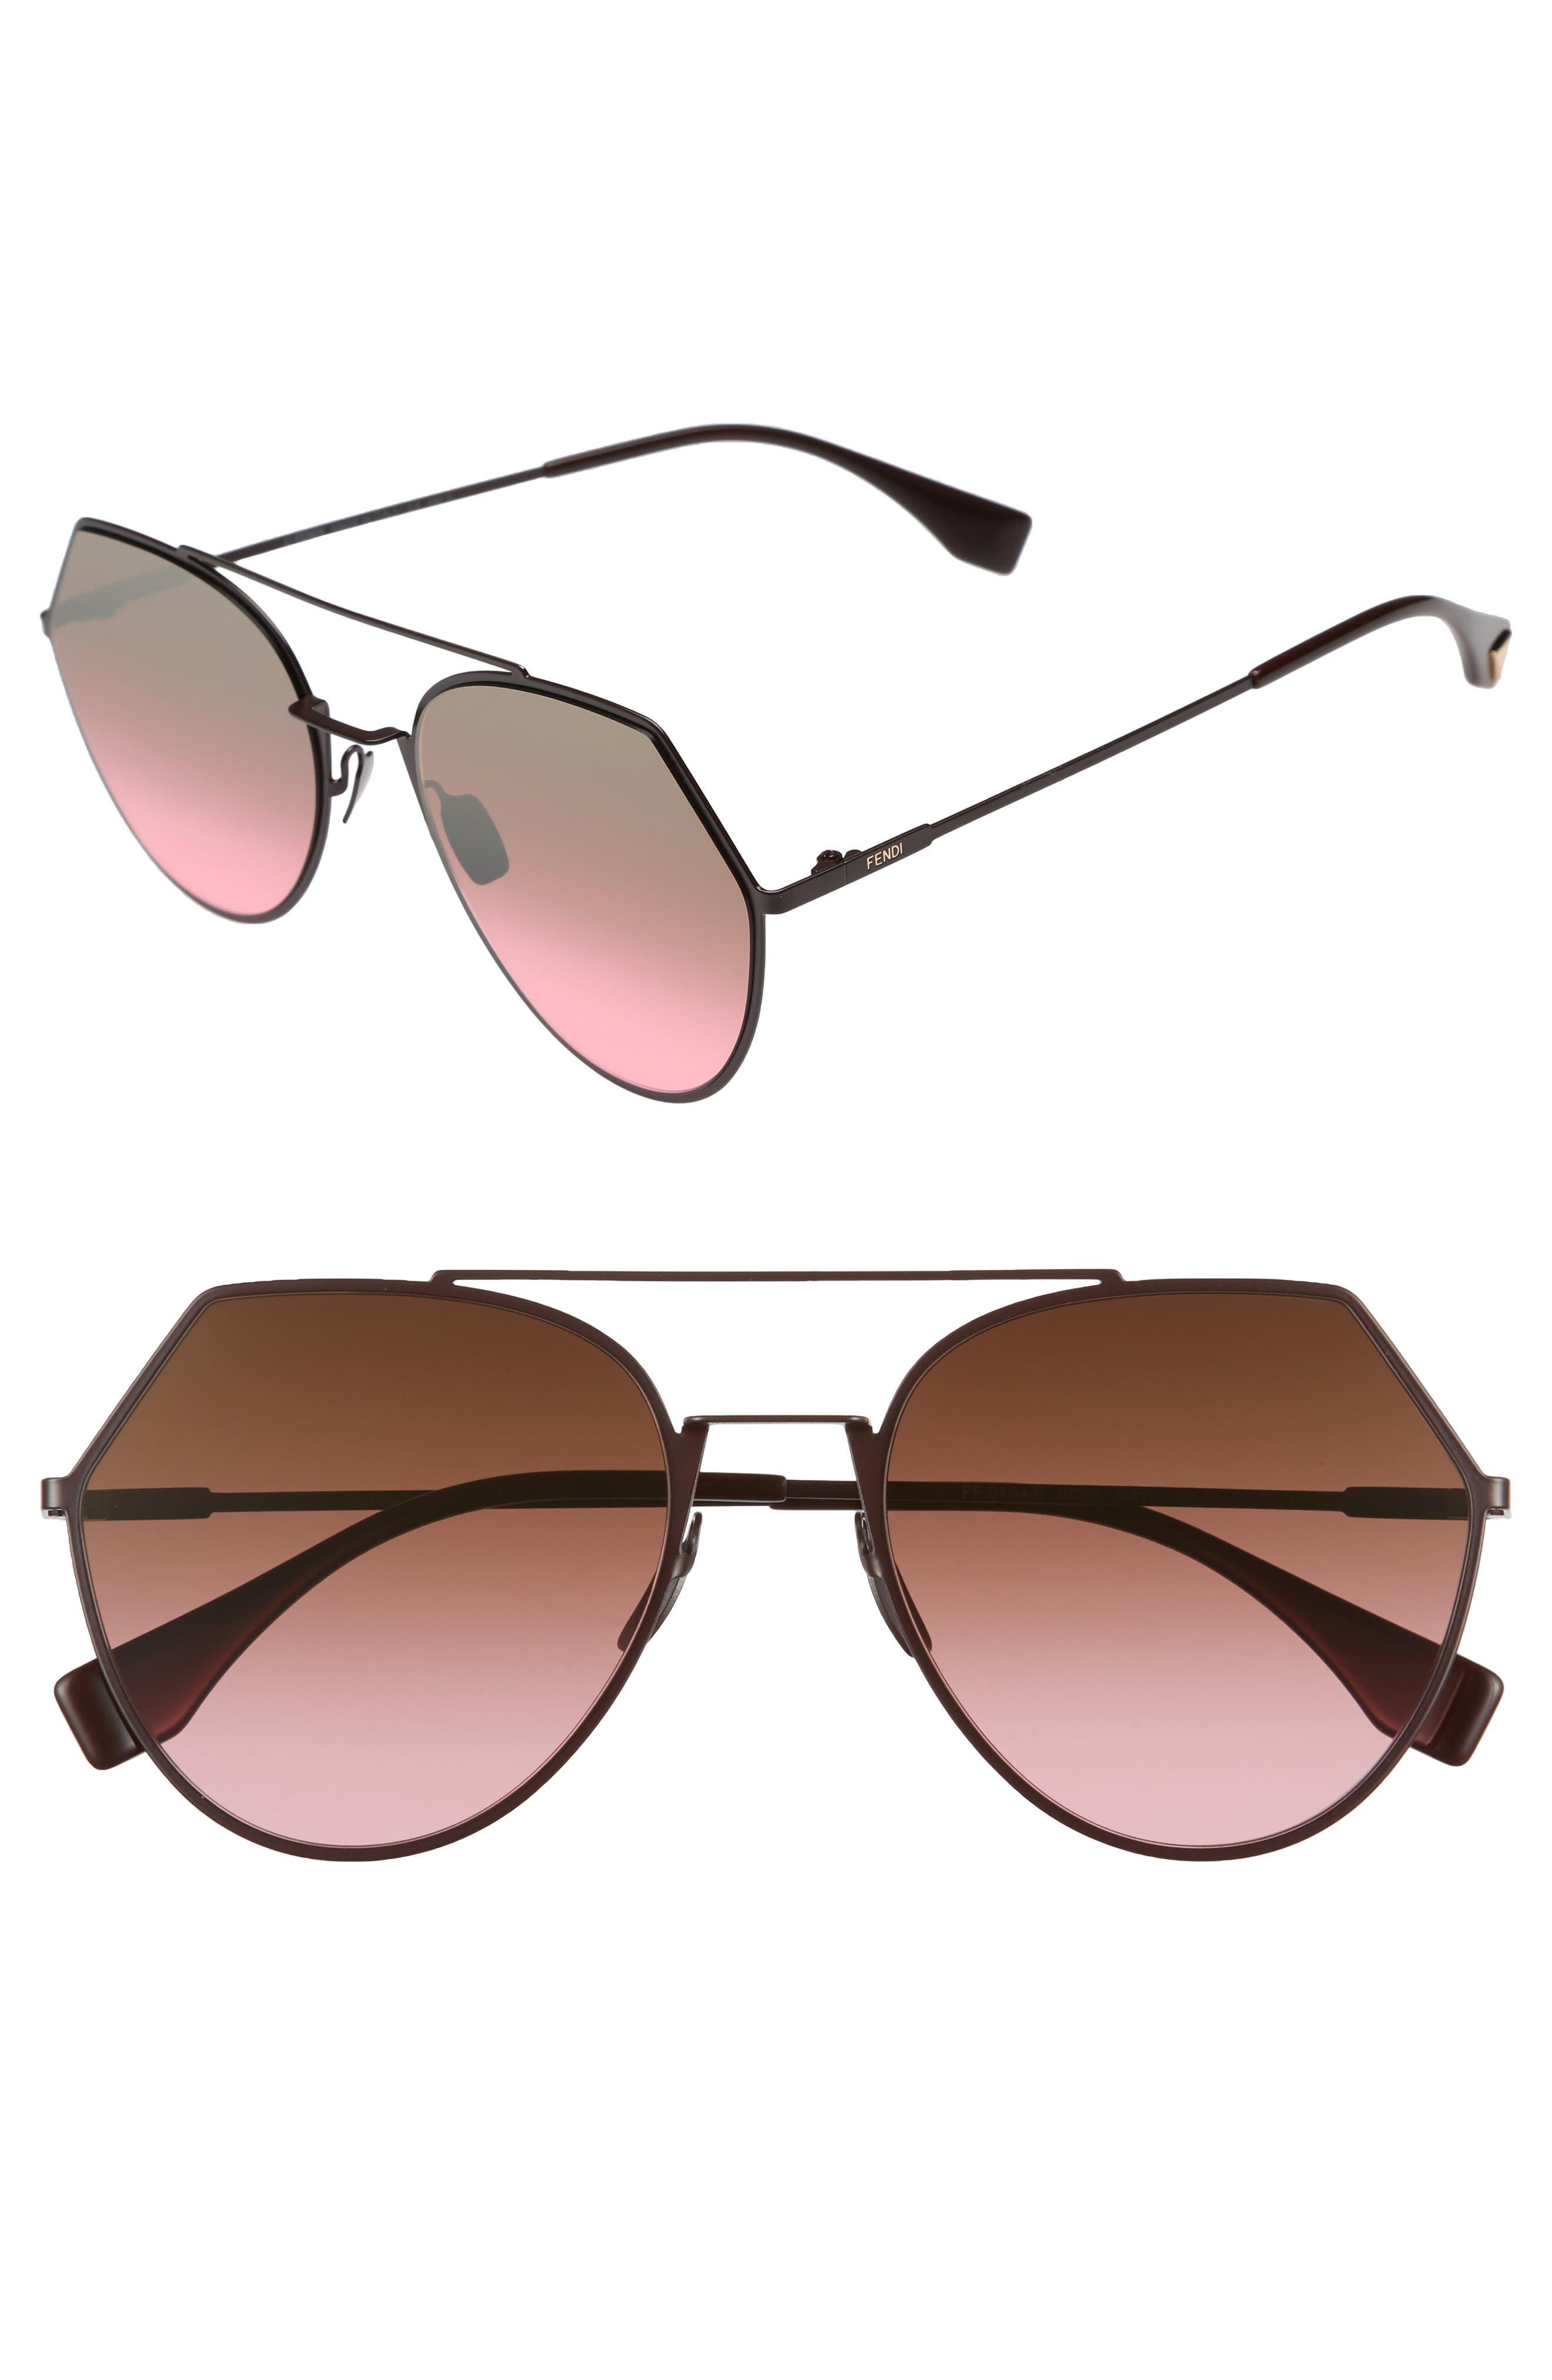 Eyeline 55mm Sunglasses,                             Main thumbnail 1, color,                             PLUM